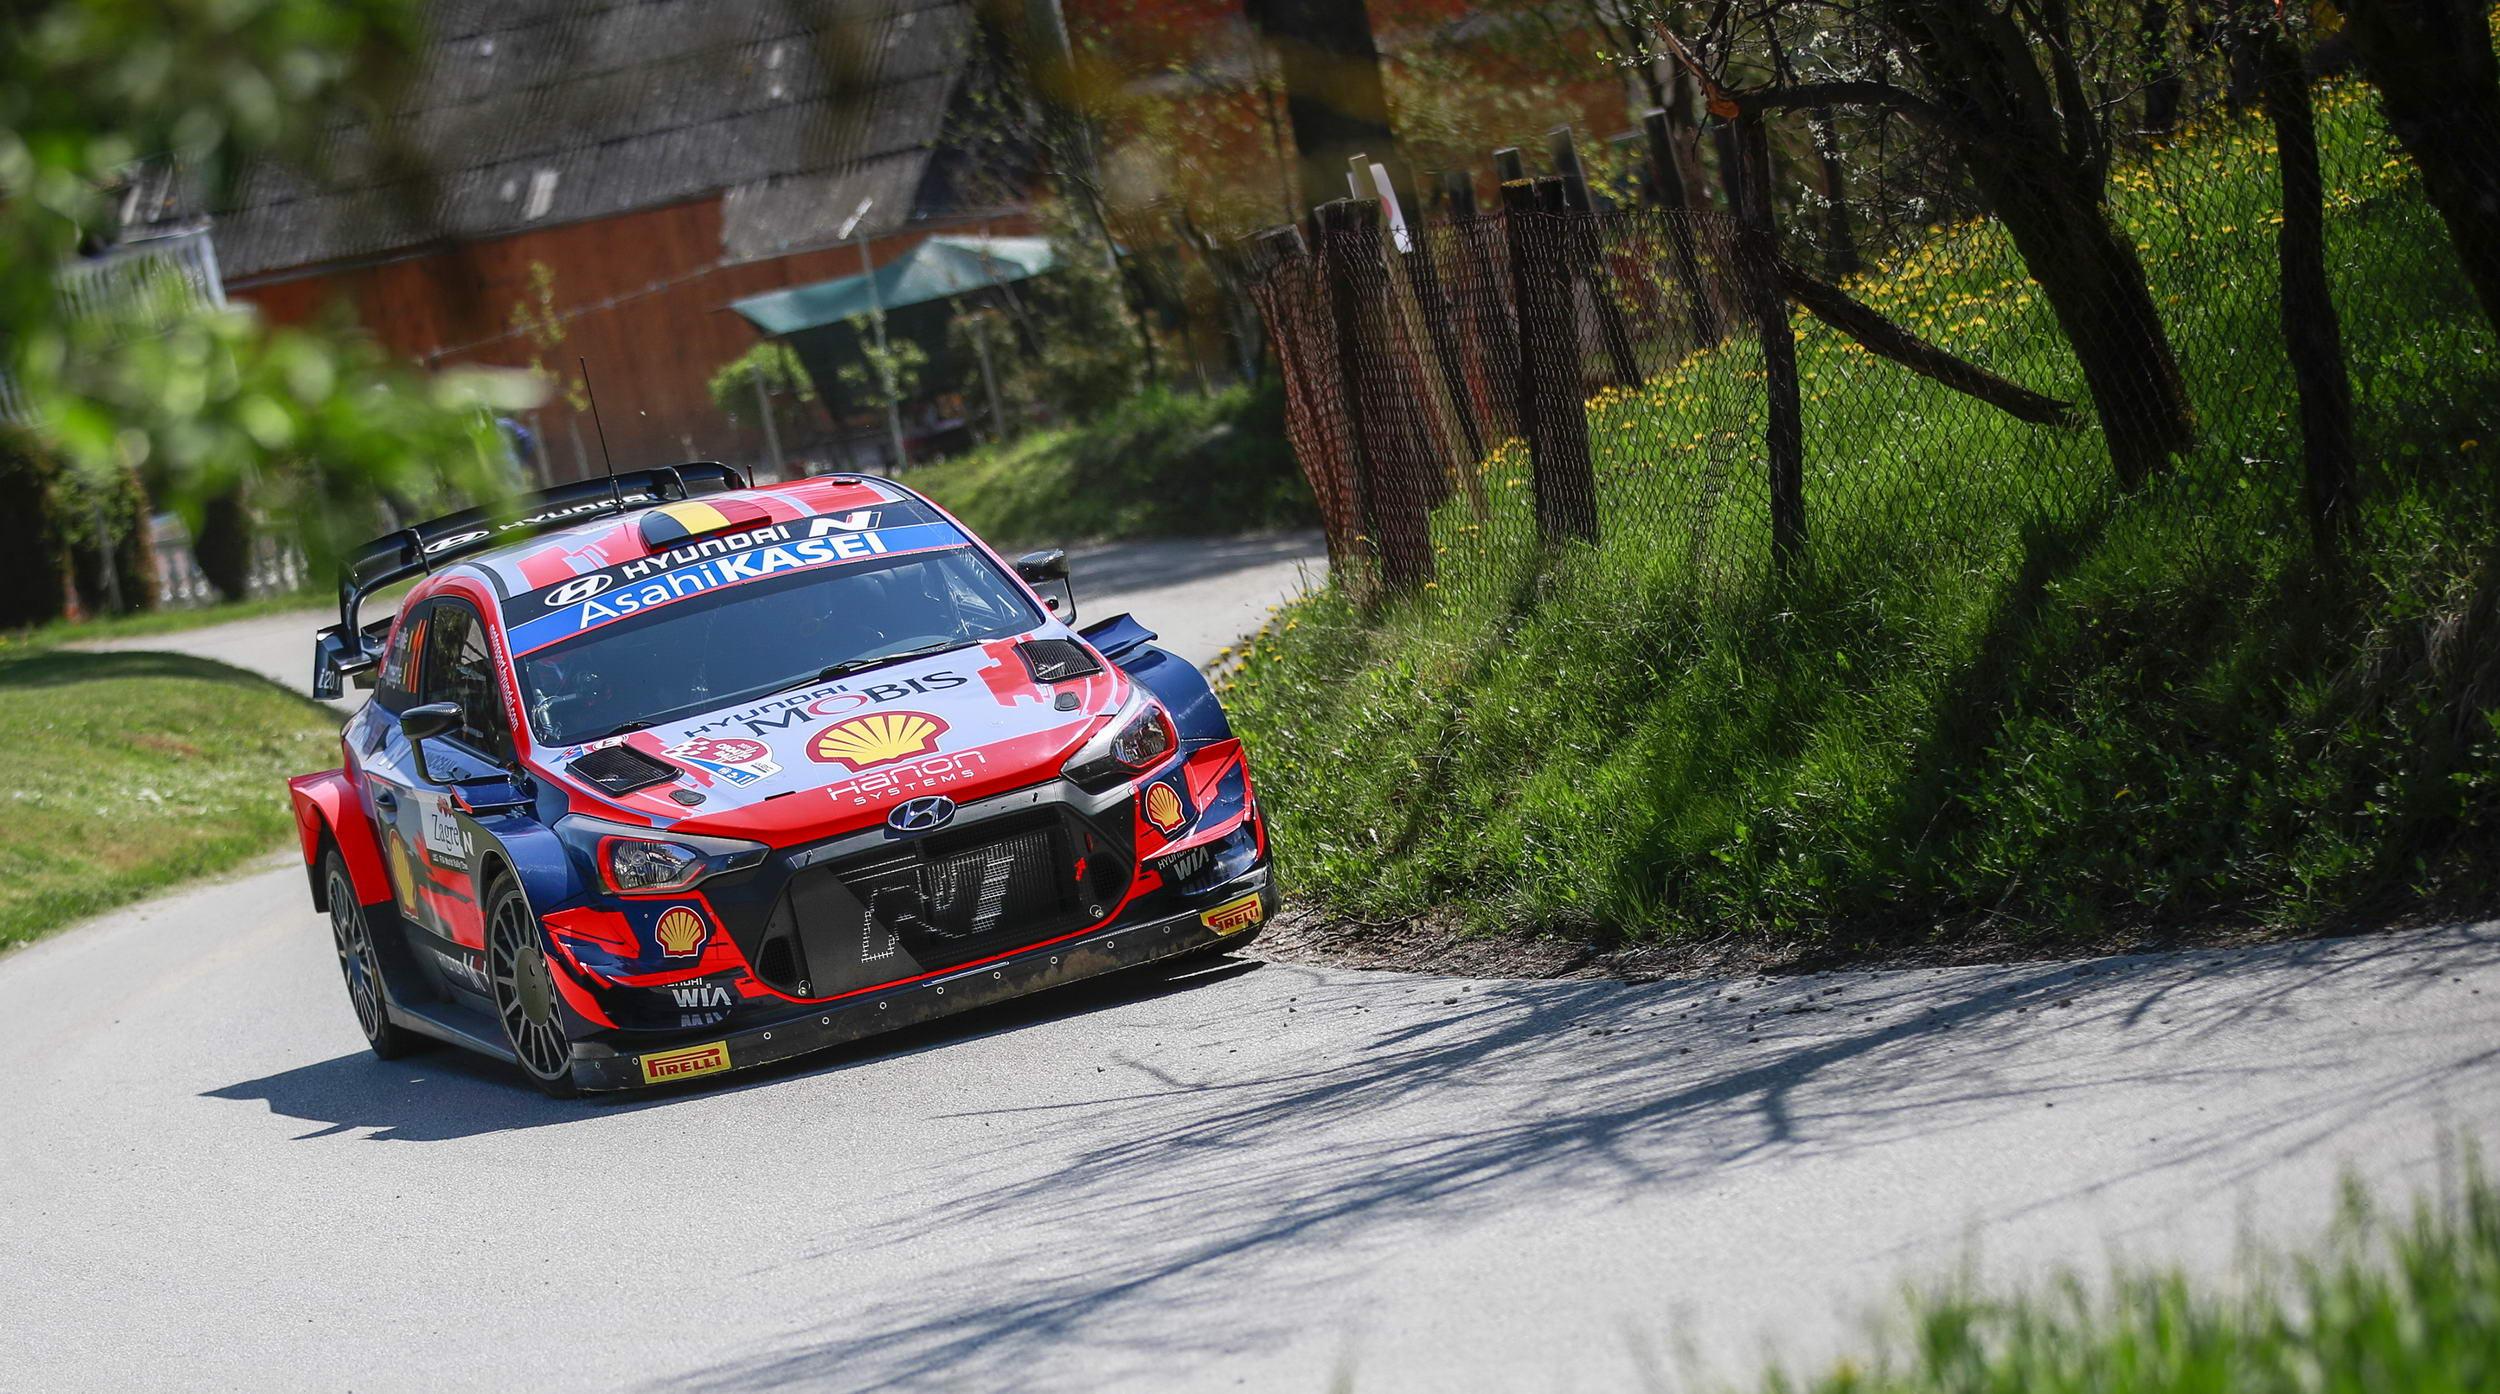 Croatia Rally - Thierry Neuville